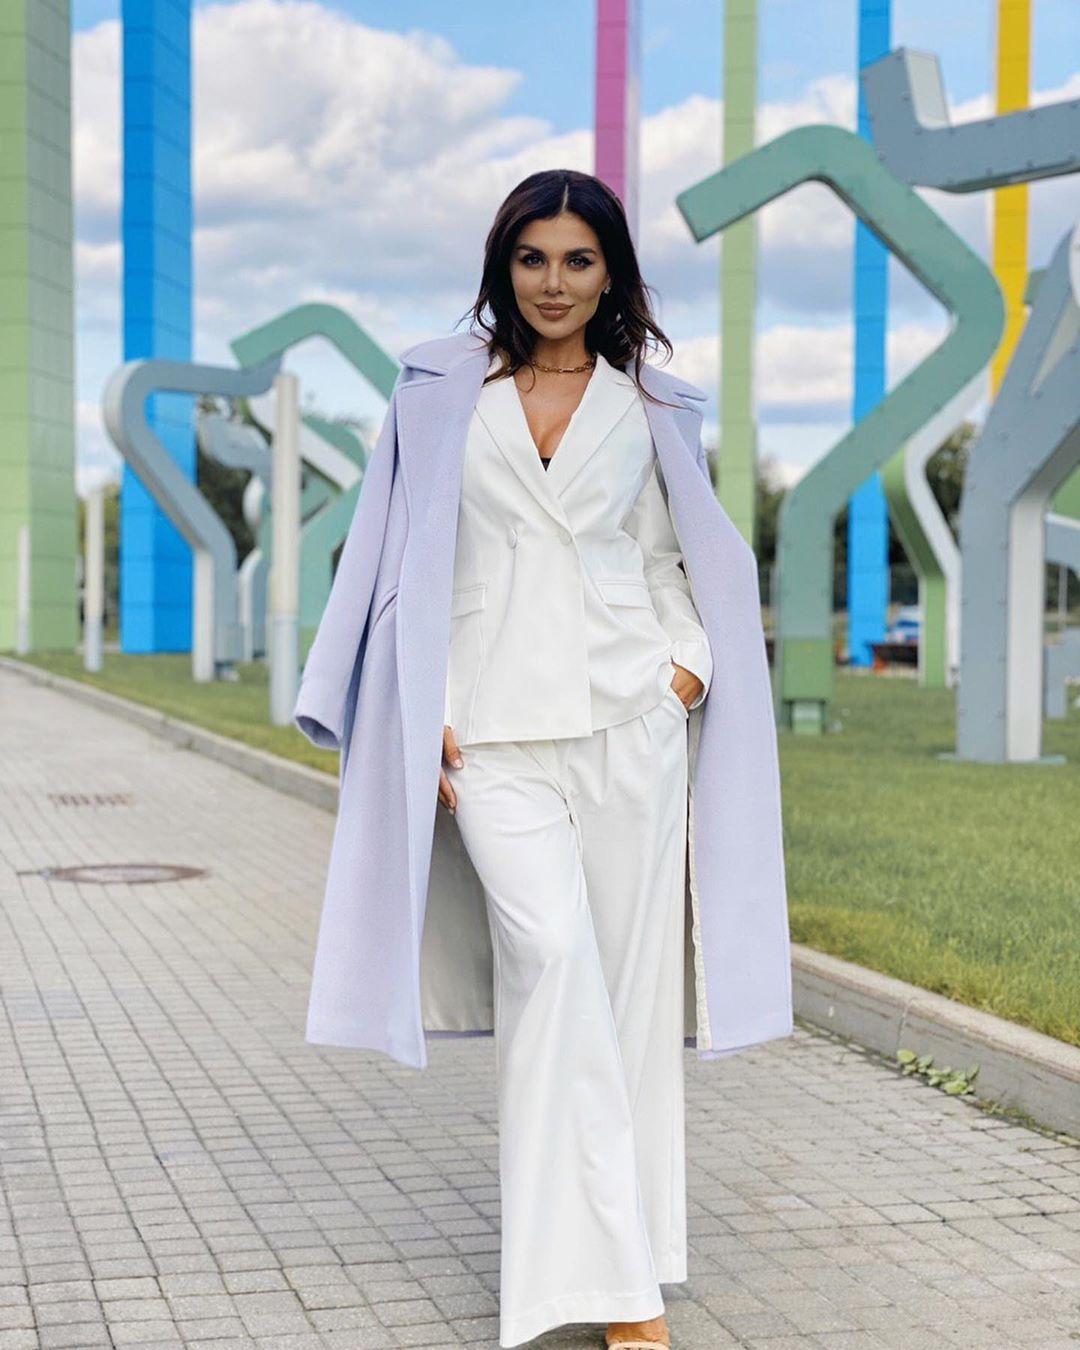 Певица показала фото / instagram.com/annasedokova